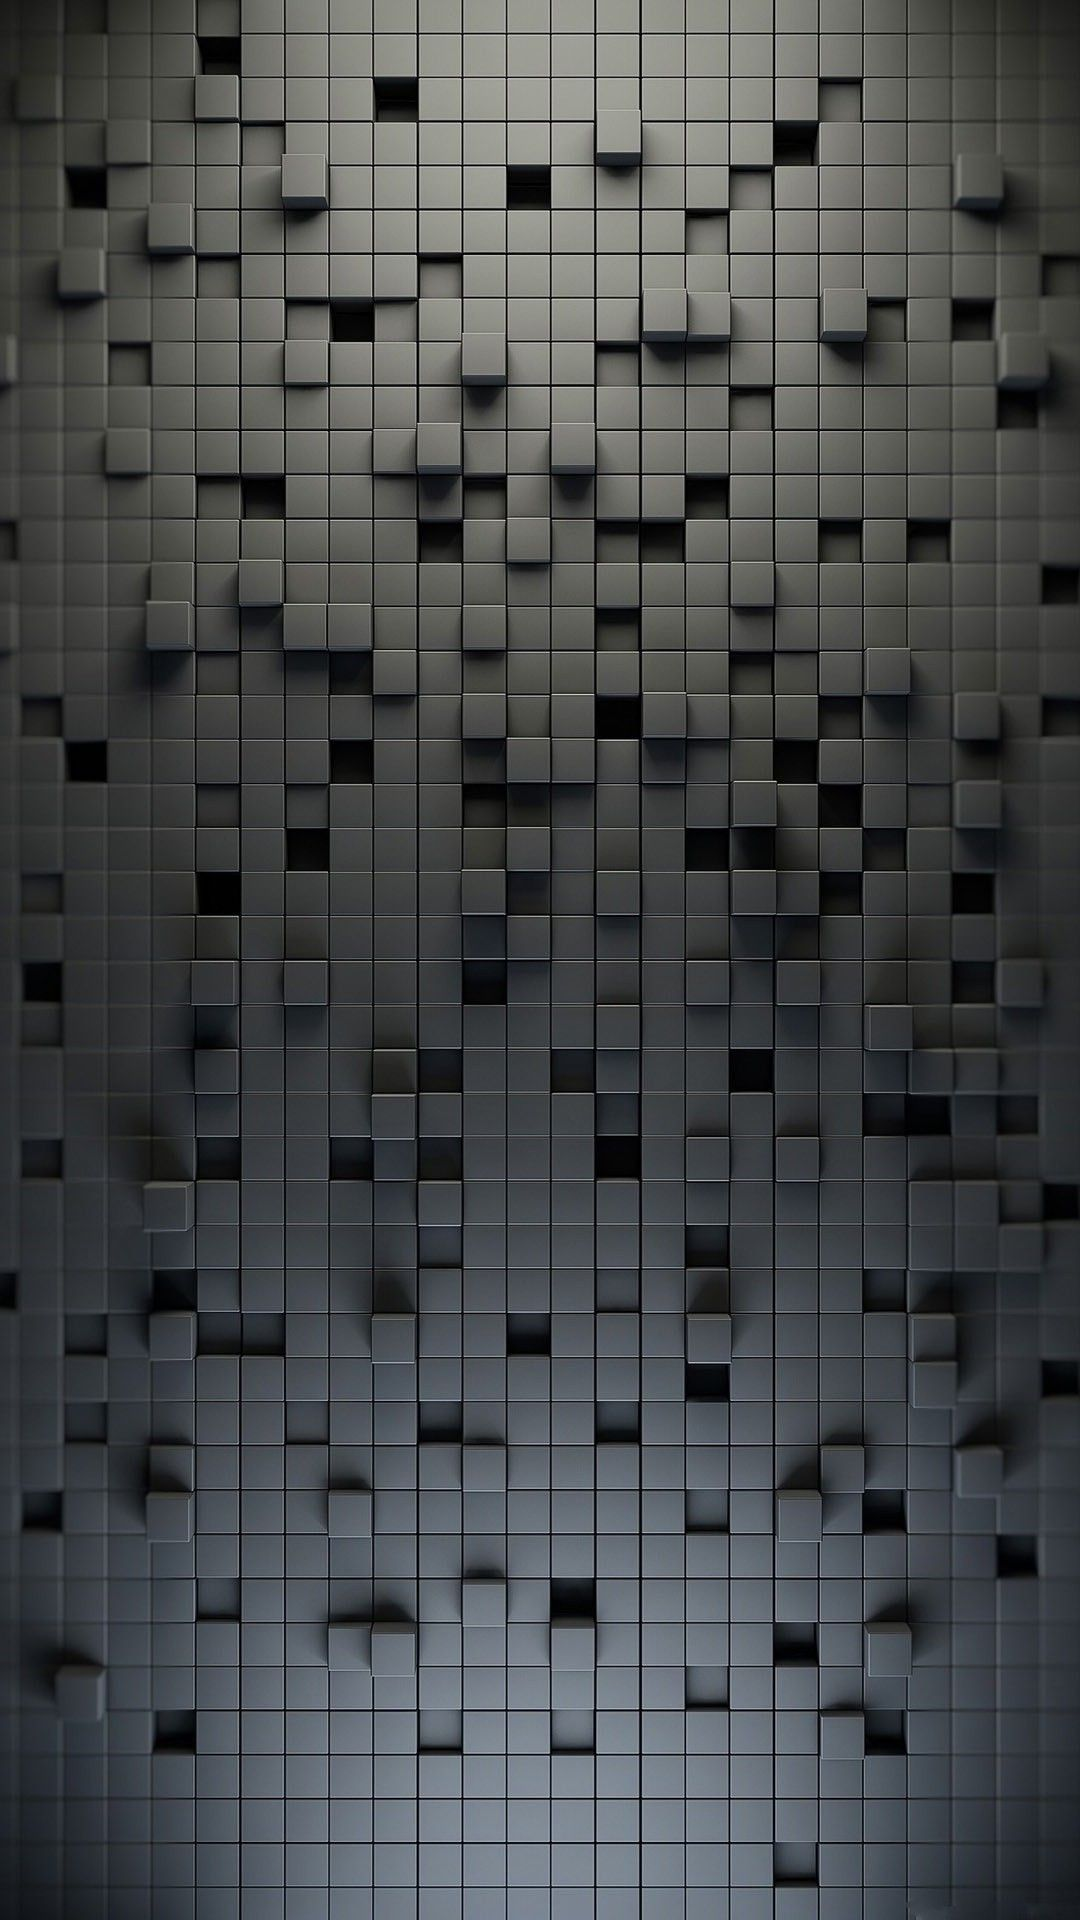 Full HD p Cube Wallpapers HD Desktop Backgrounds x